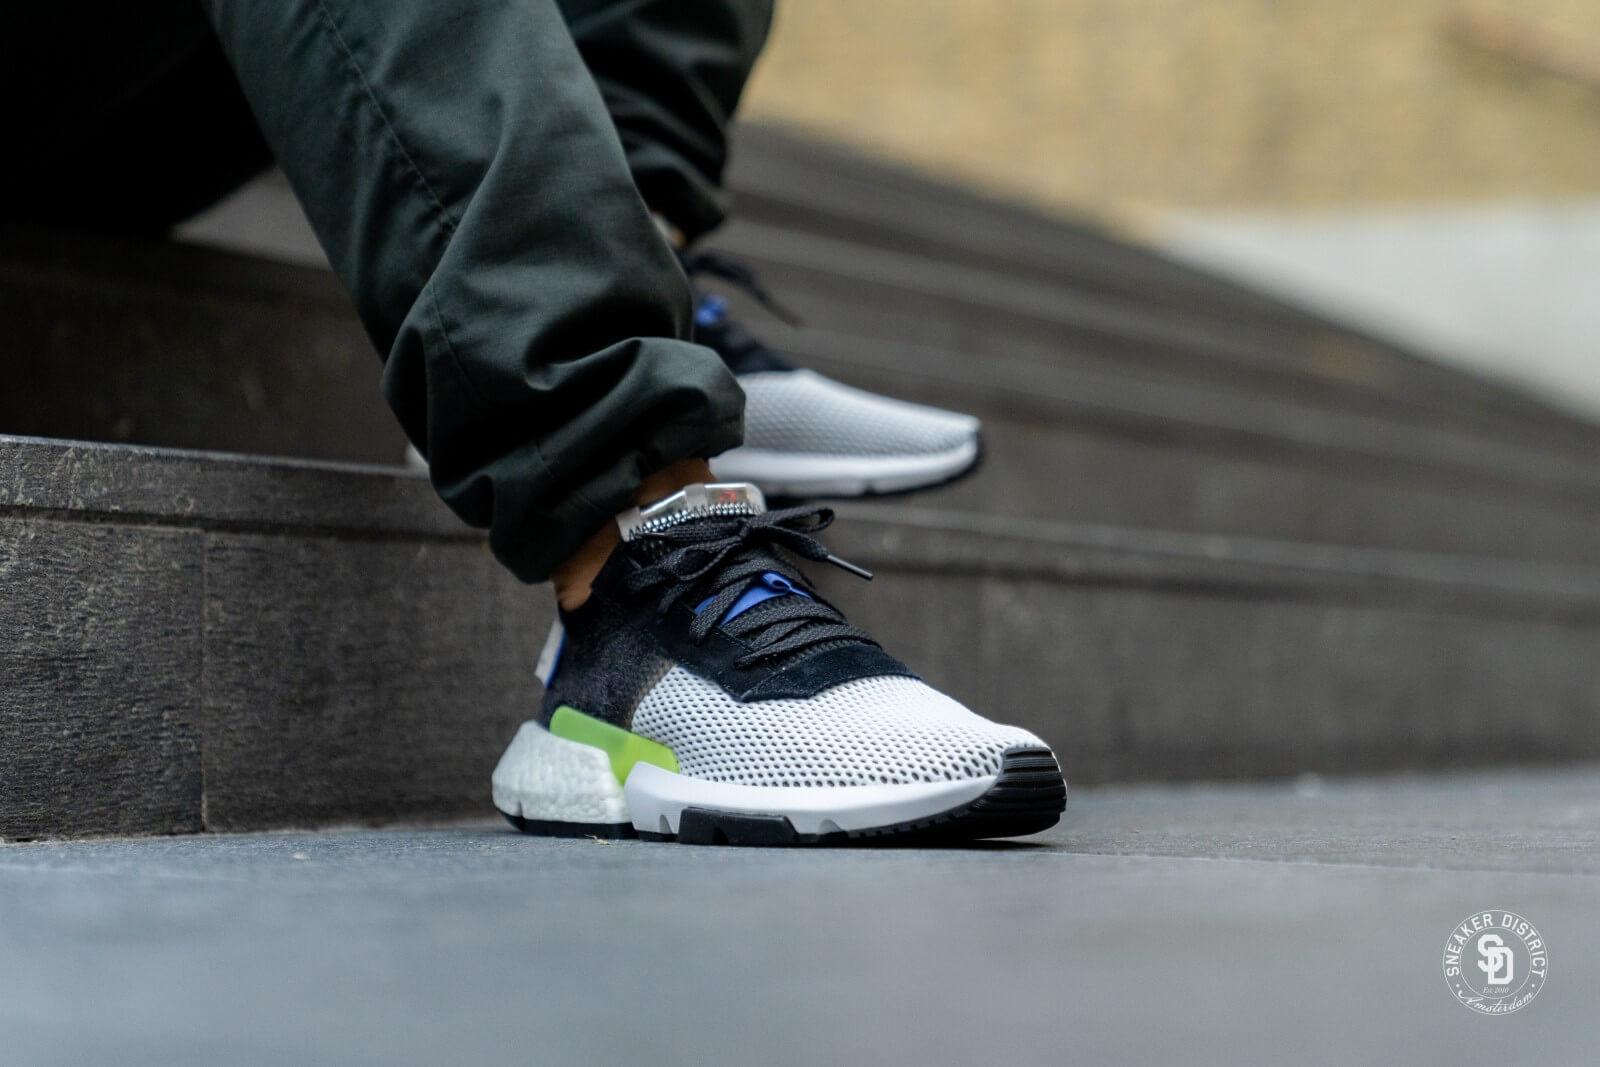 Adidas POD-S3.1 White/Grey - CG5947